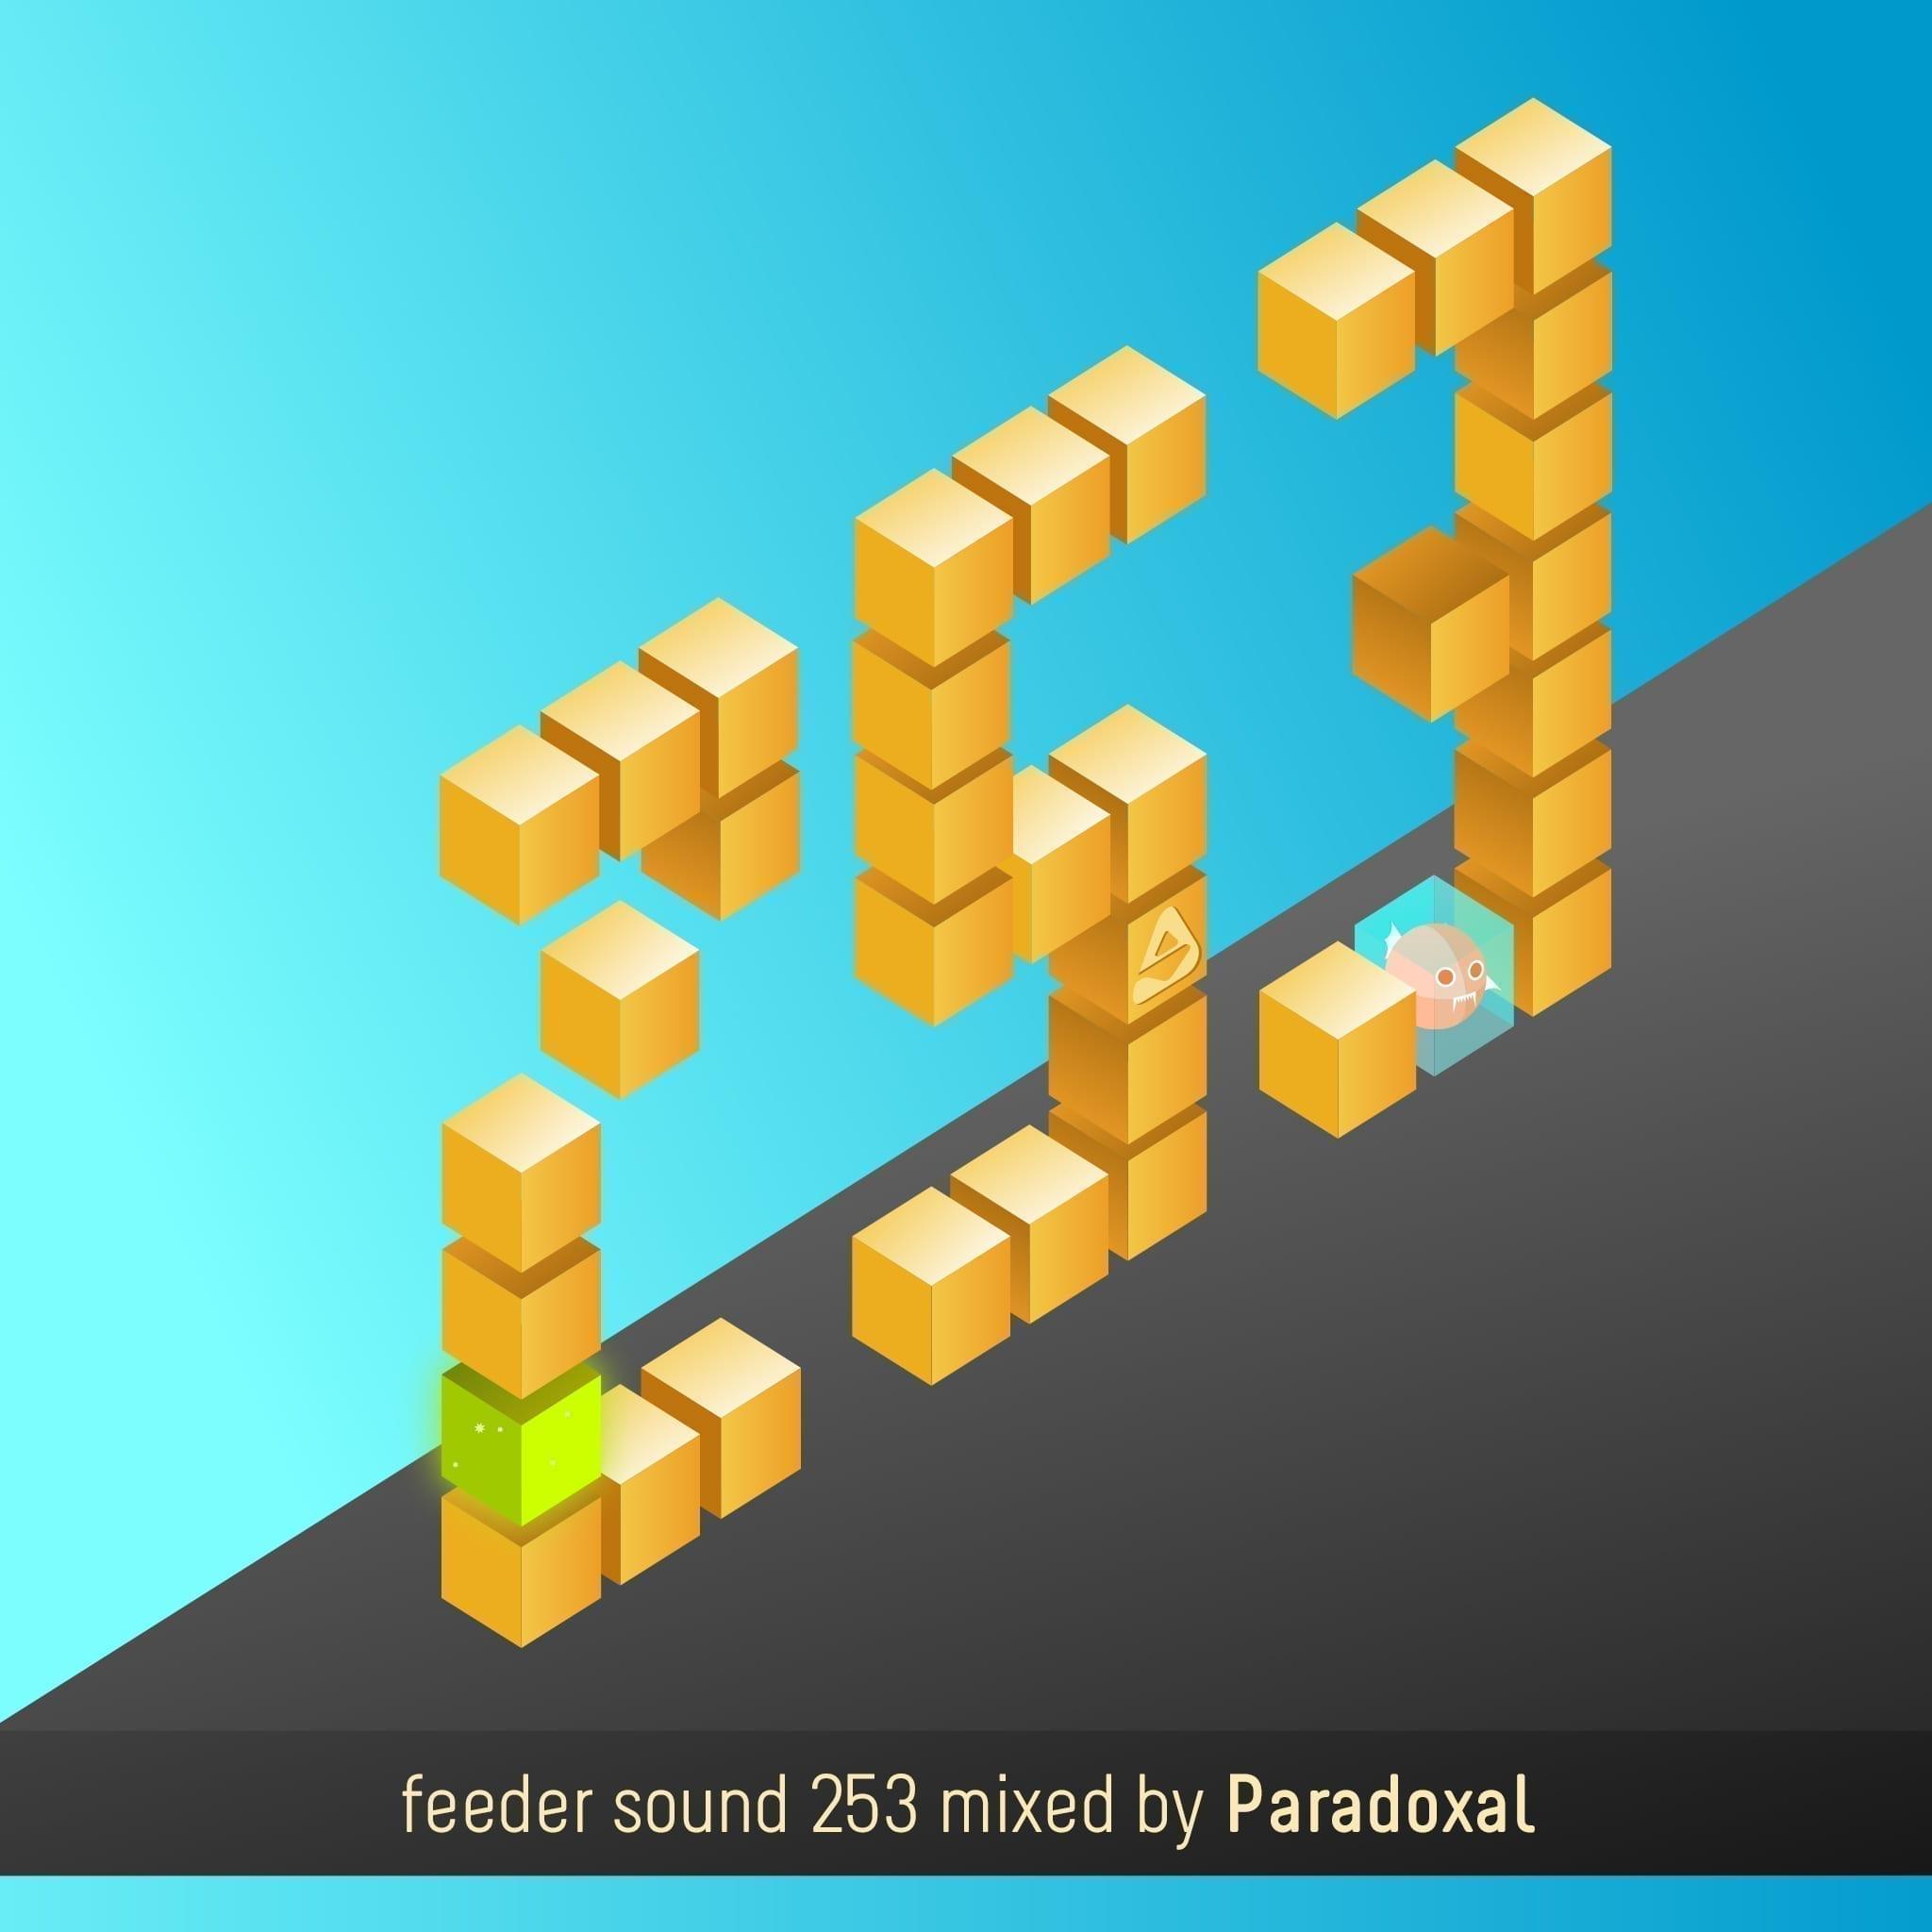 feeder sound 253 mixed by Paradoxal 01